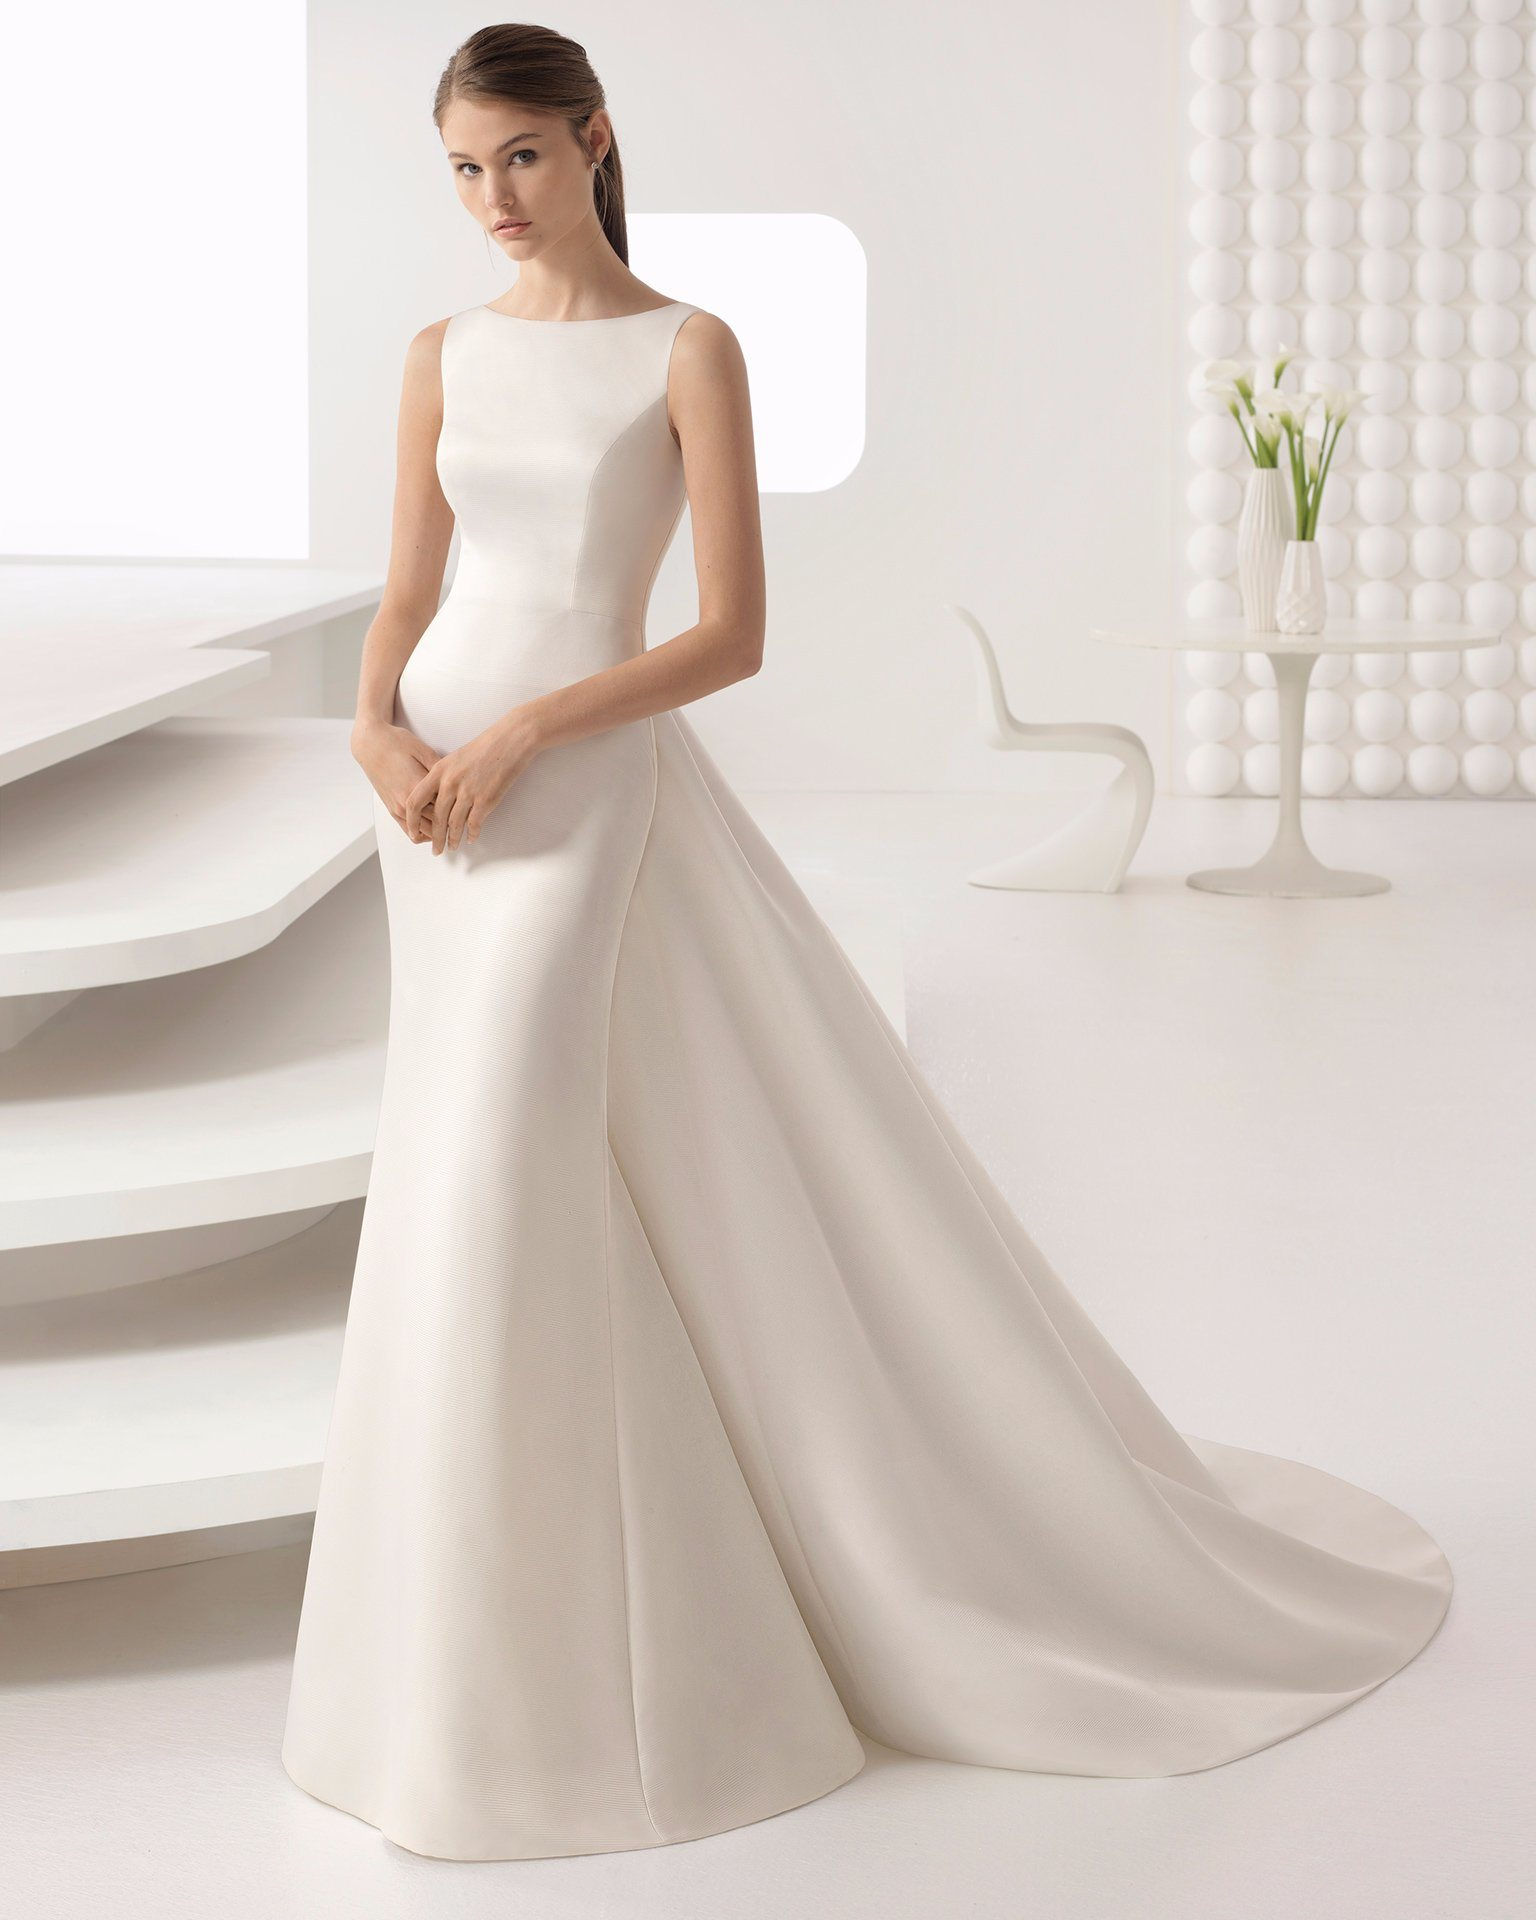 91e5f45929cbf Mermaid Wedding Dress With Removable Train